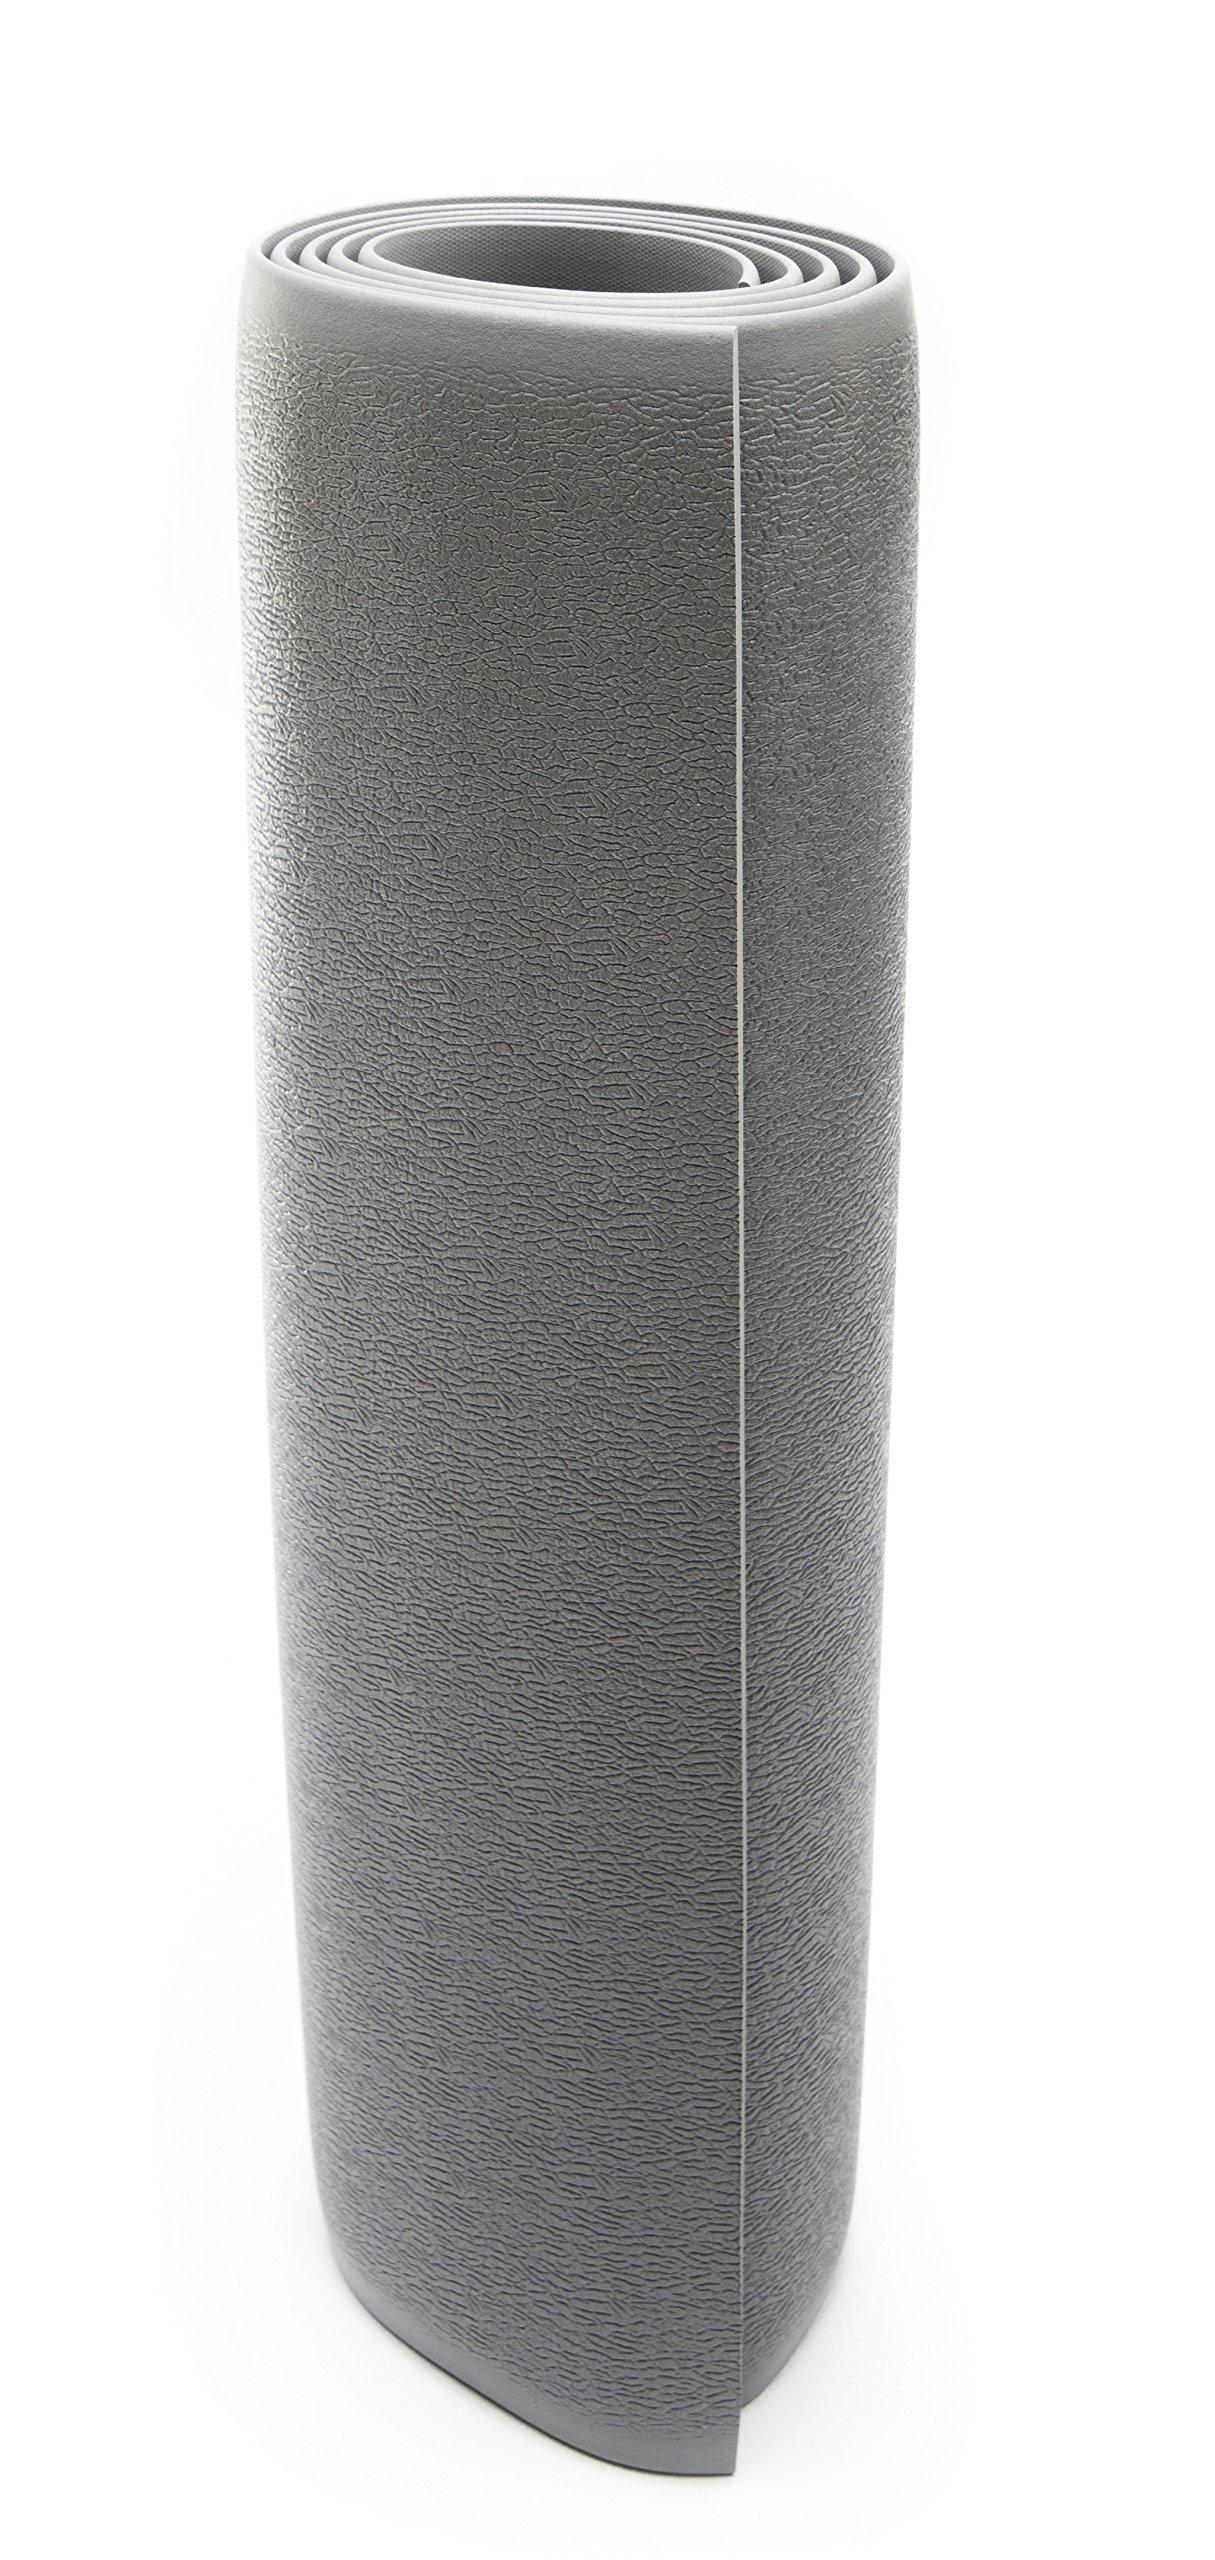 Bertech ESD Anti Fatigue Floor Mat Roll, 3' Wide x 10' Long x 0.375'' Thick, Gray (Made in USA) by Bertech (Image #3)